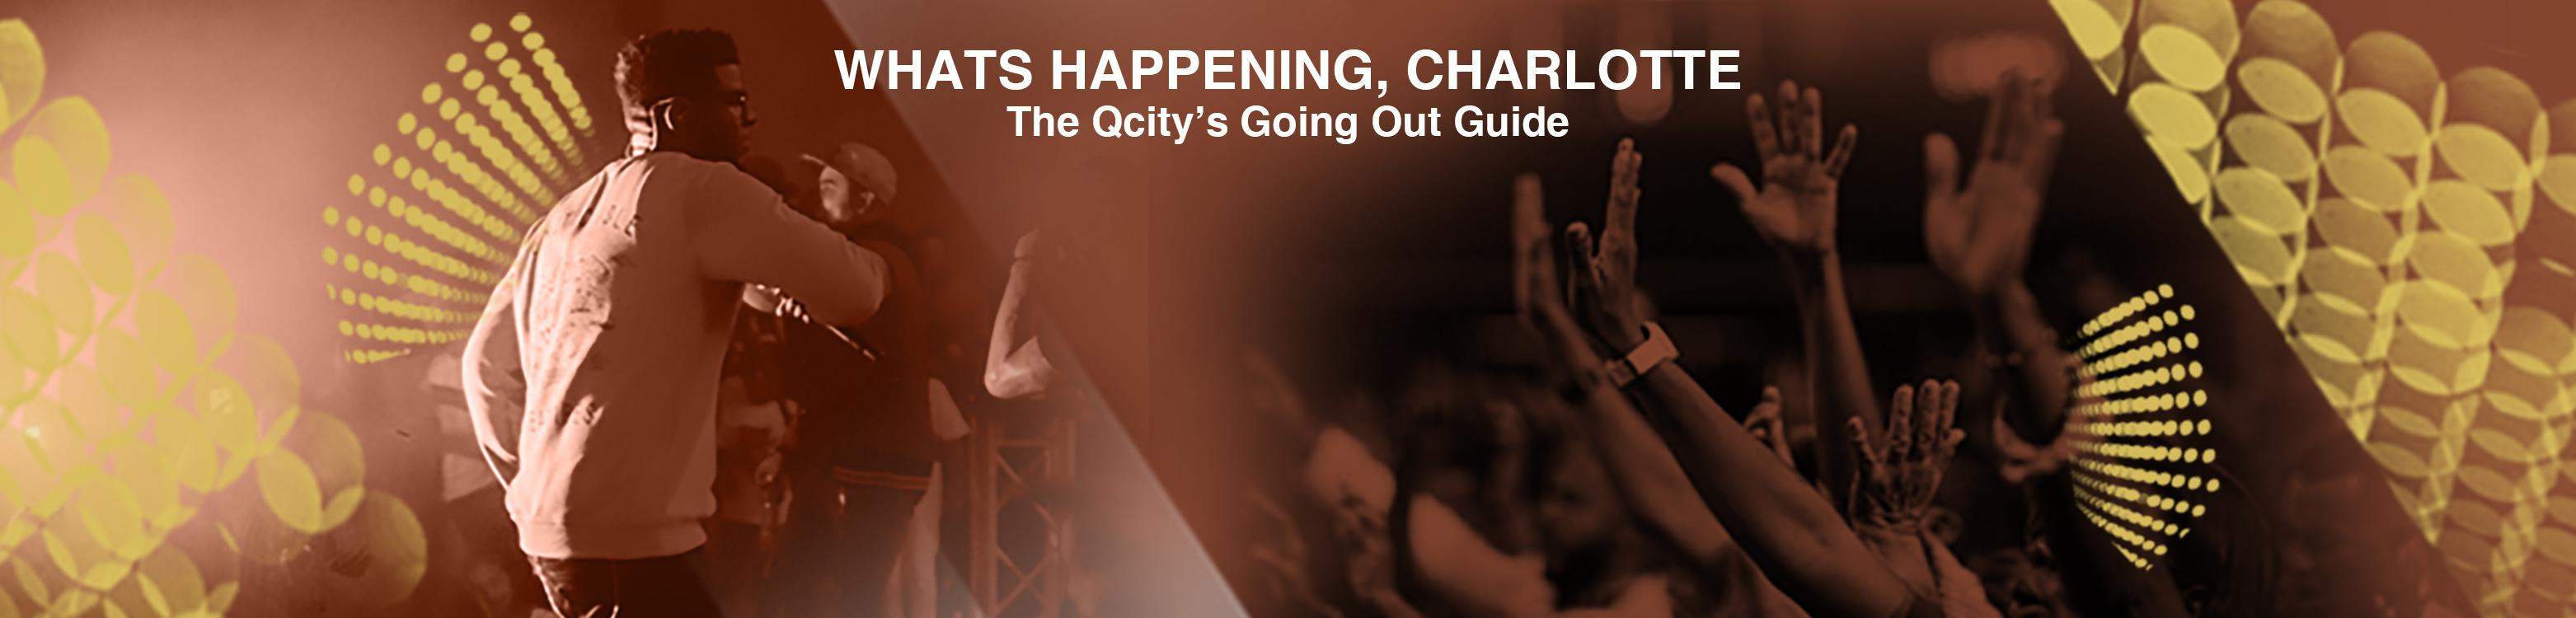 Events | Entertainment | Qcitymetro | Charlotte, NC